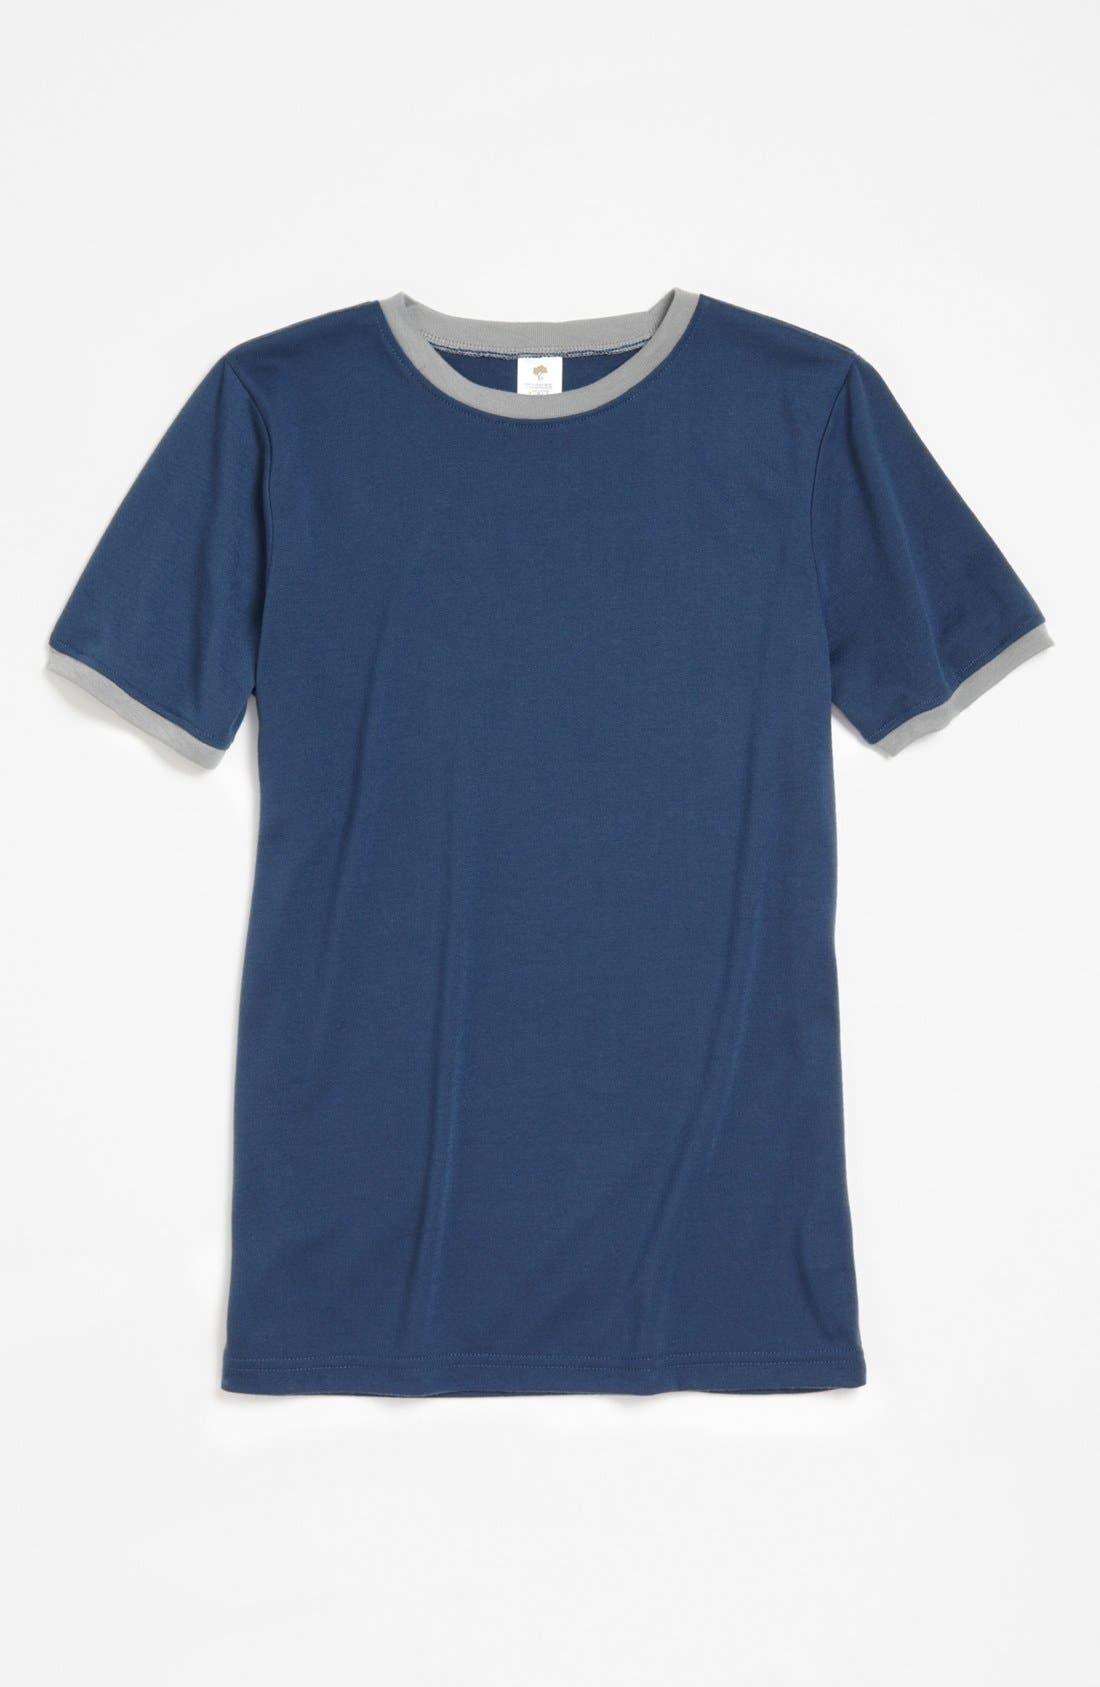 Main Image - Tucker + Tate 'Ringer' Sleep T-Shirt (Little Boys & Big Boys)